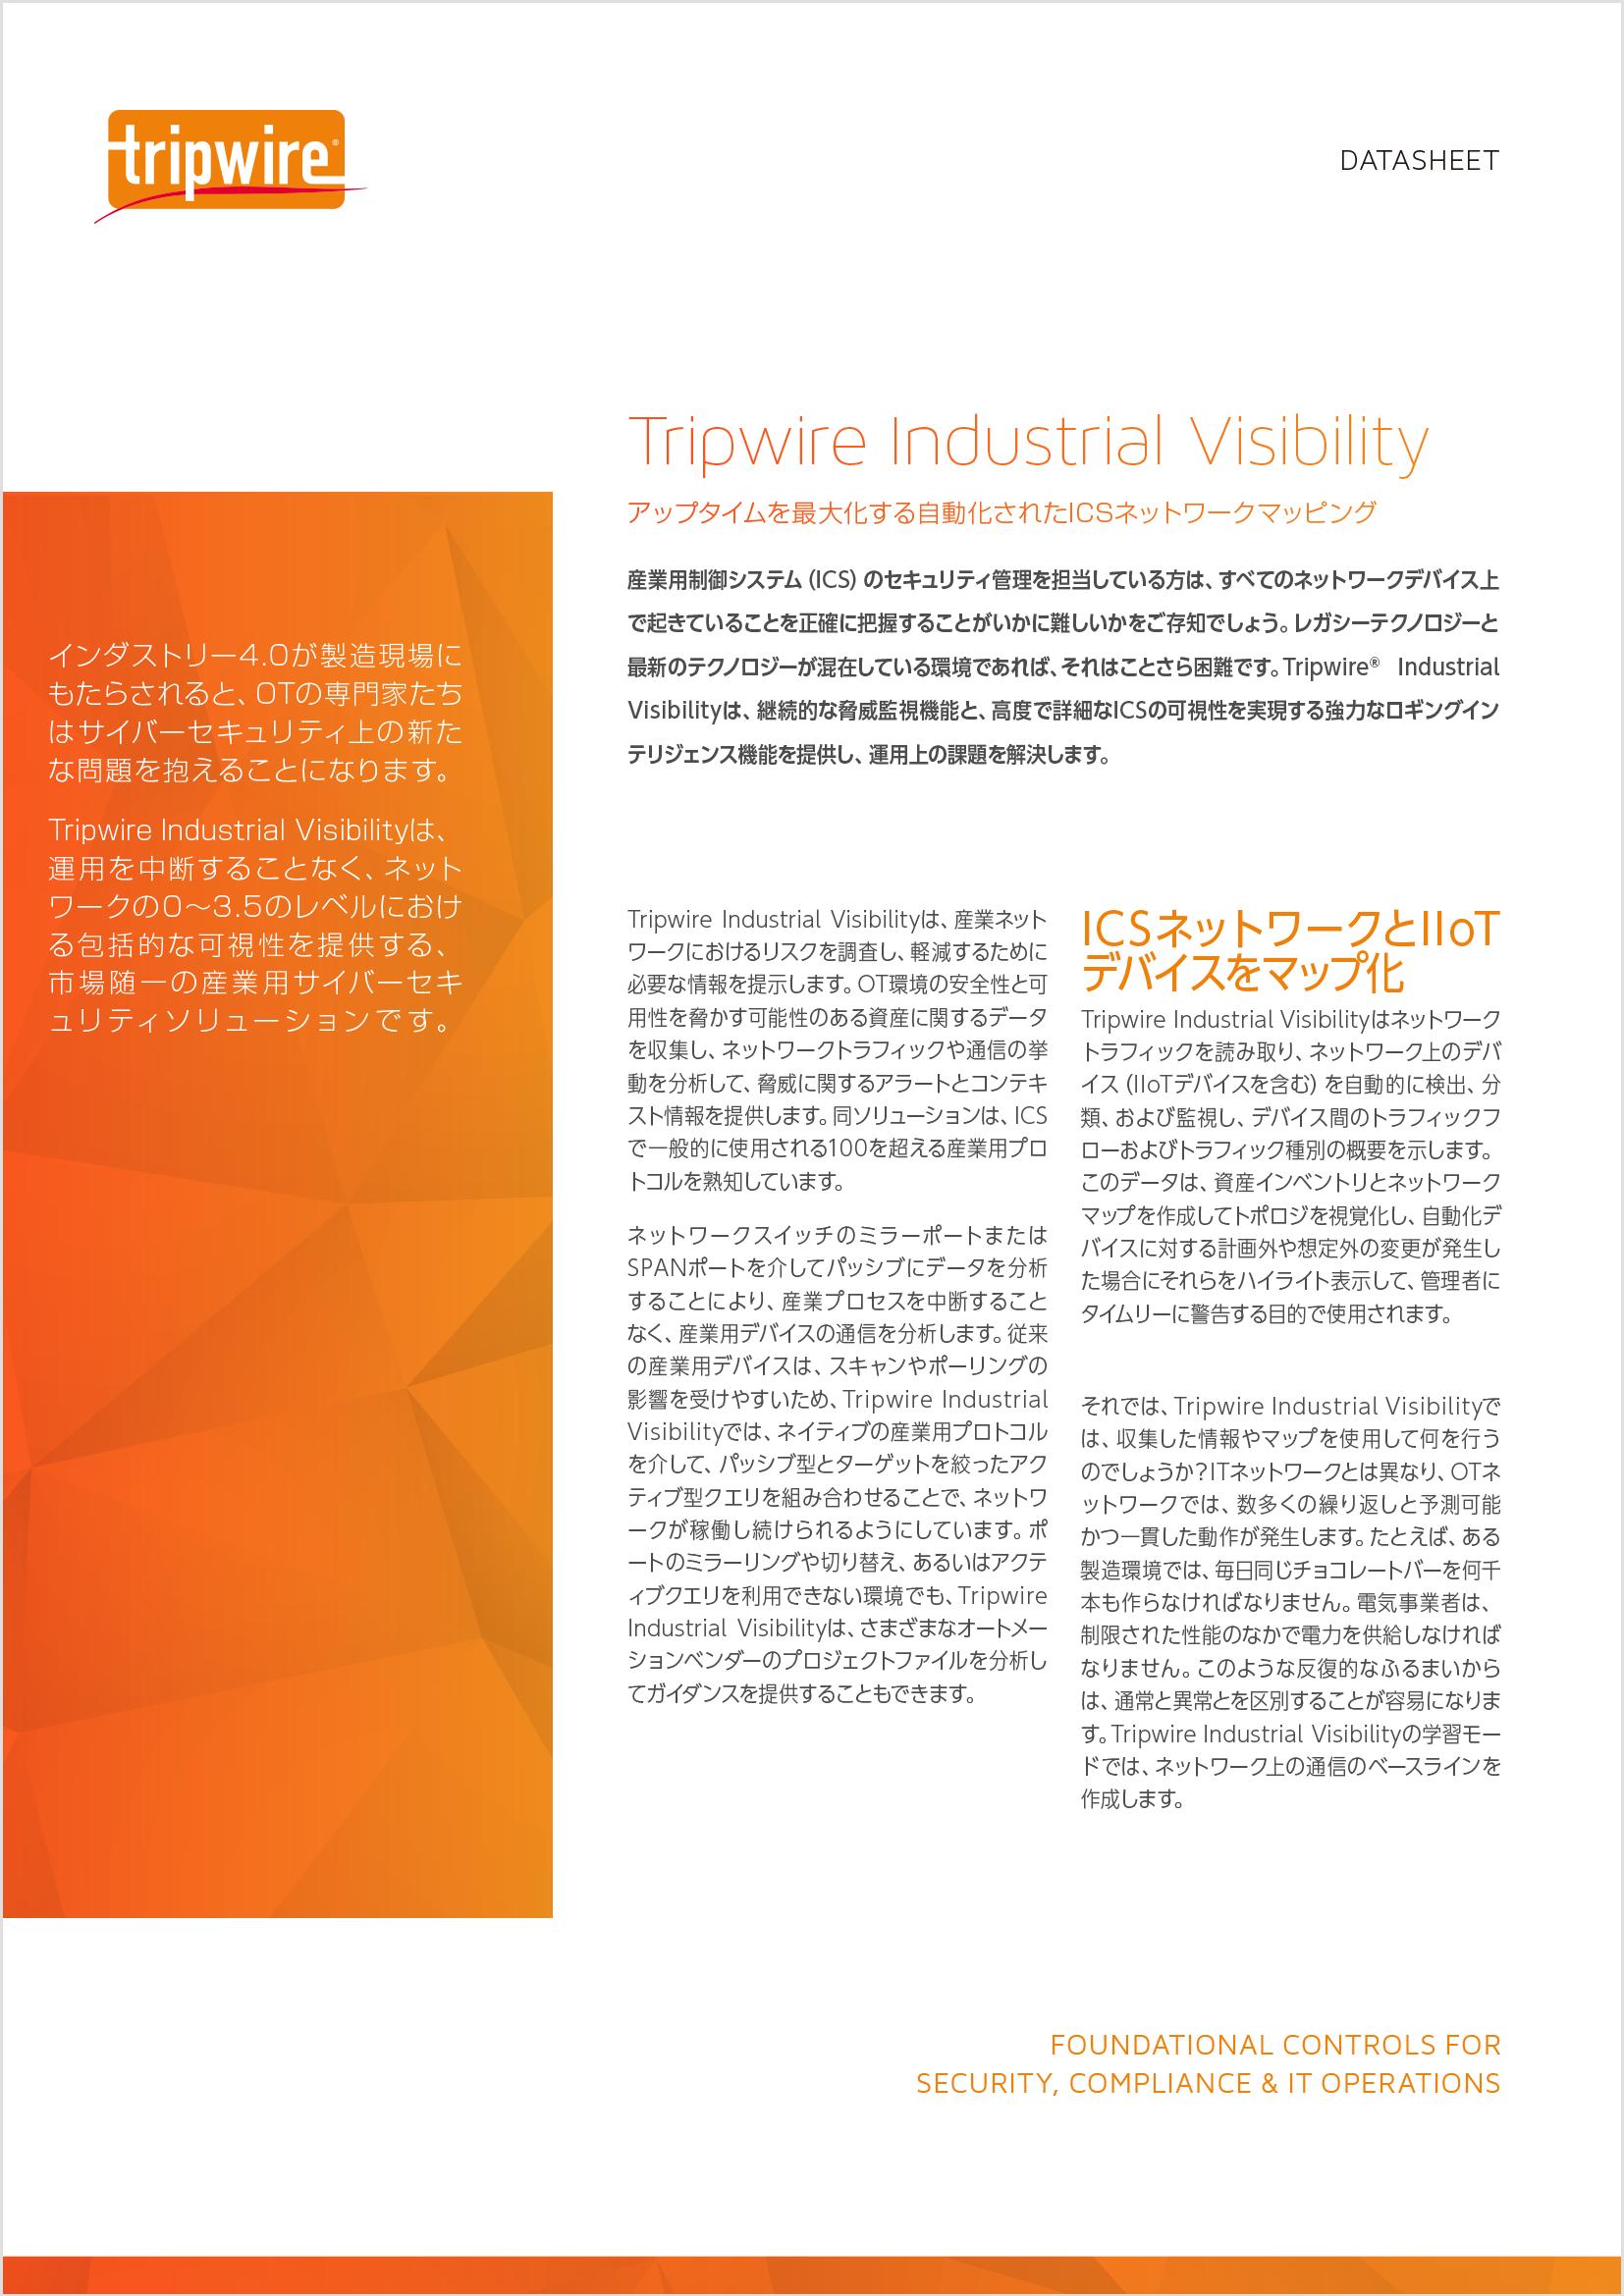 Tripwire Industrial Visibilityデータシート